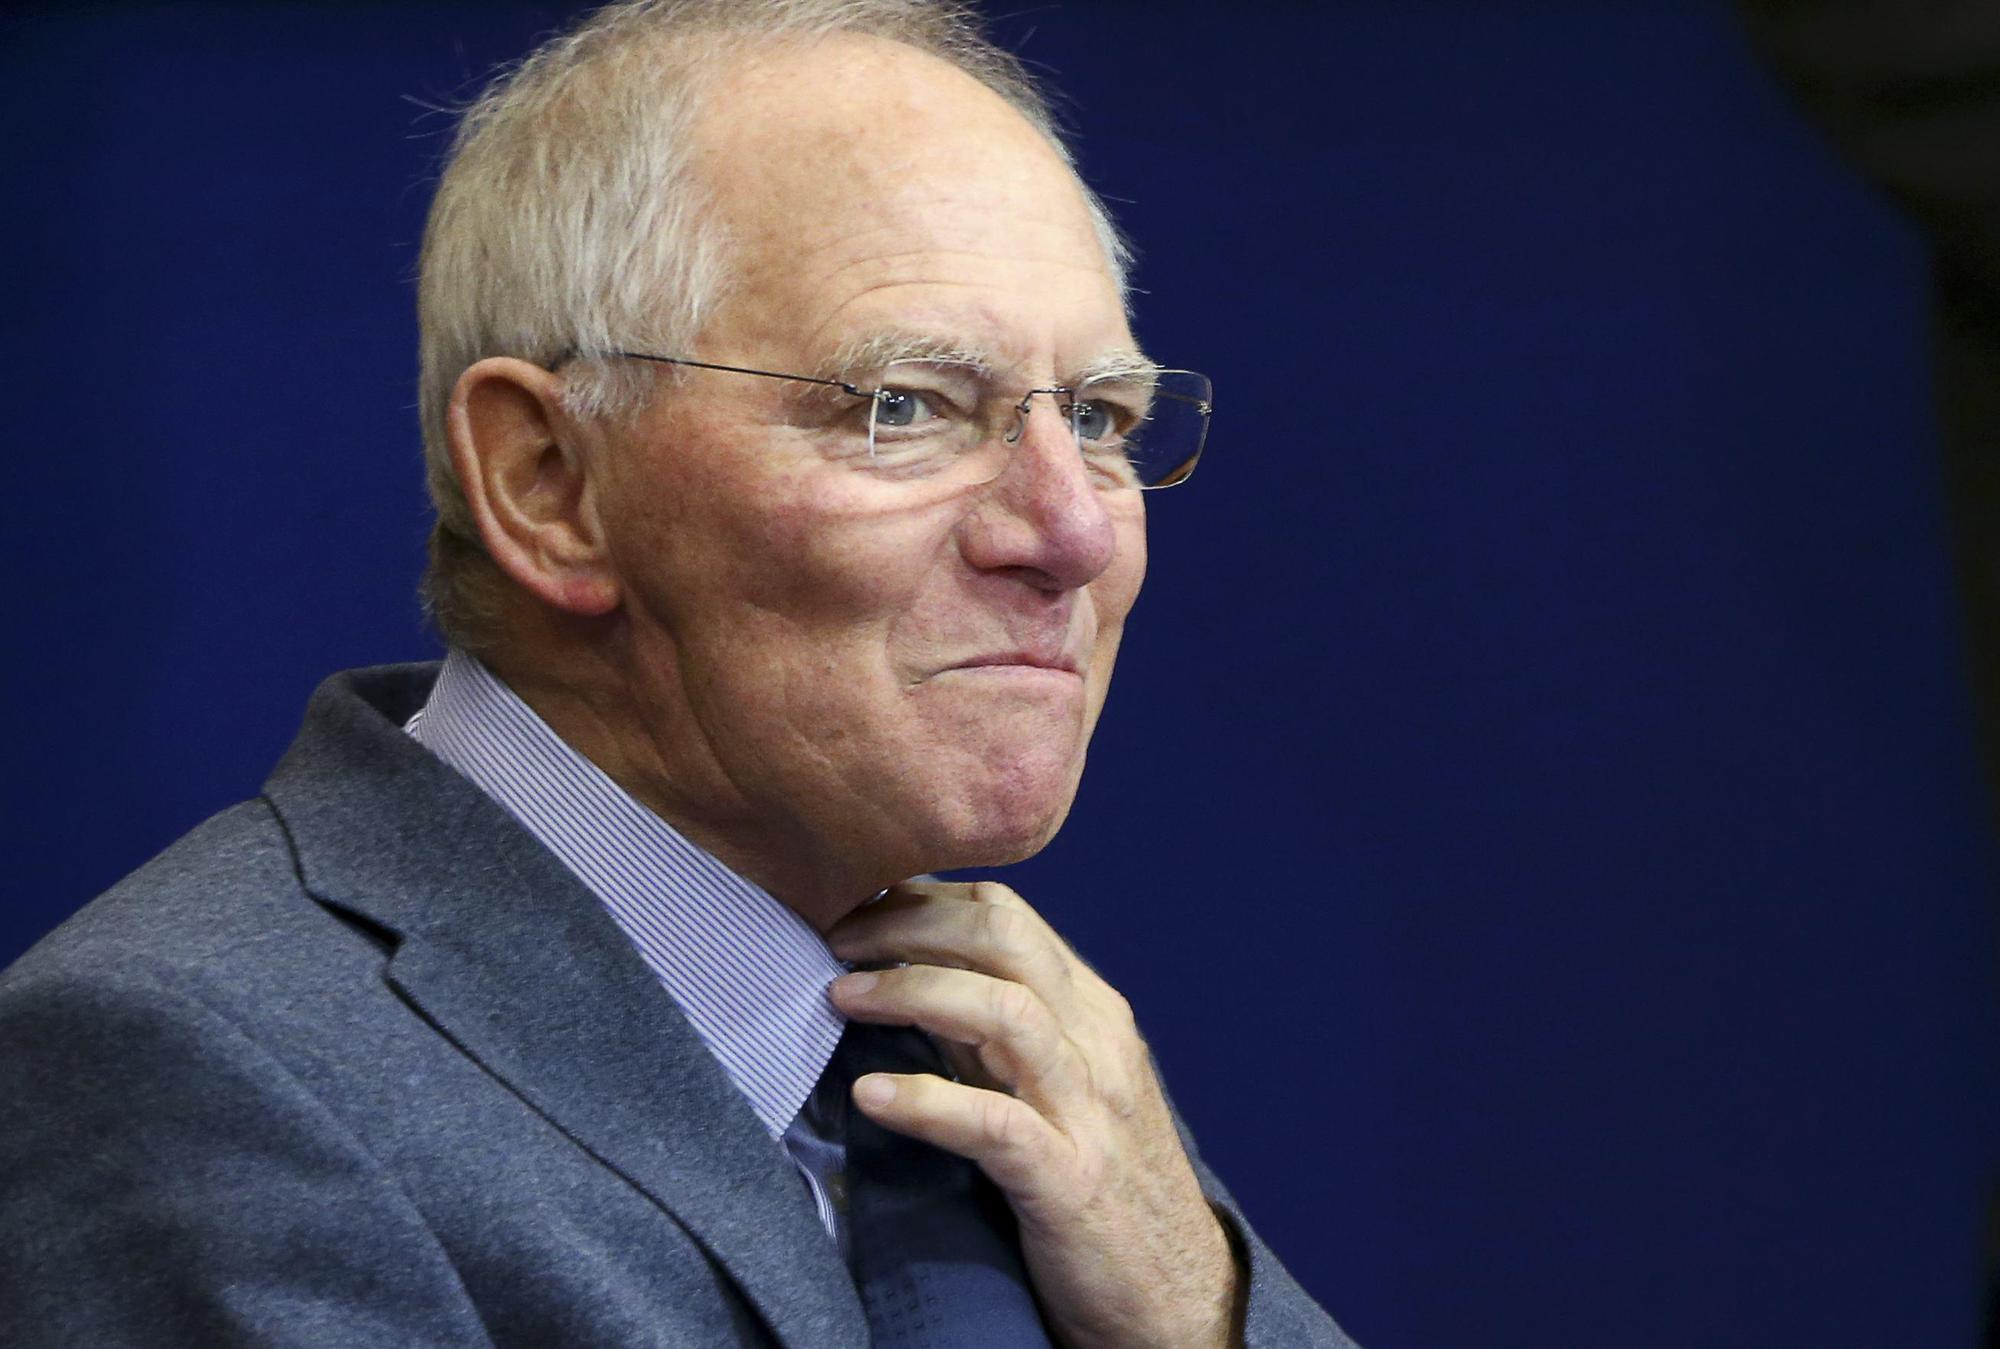 Wolfgang Schäuble. Υπουργός Οικονομικών Γερμανίας